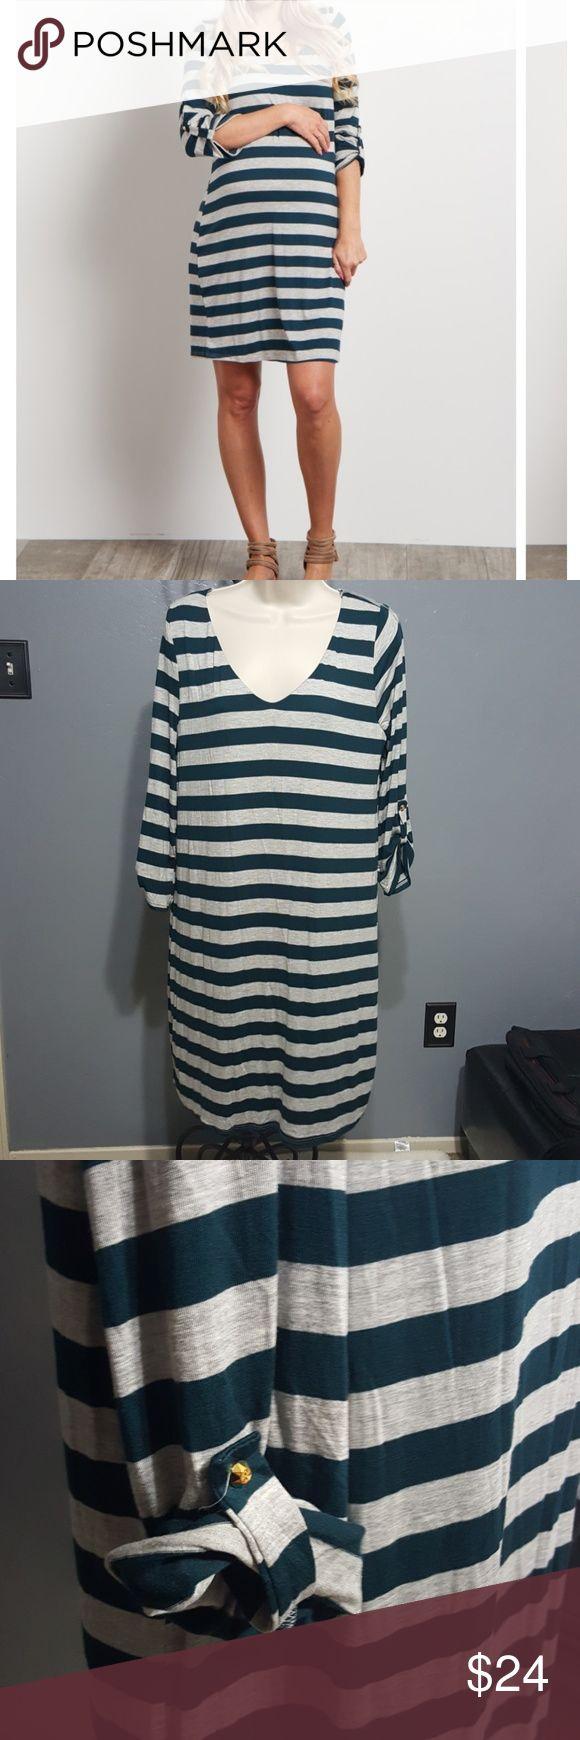 Pinkblush Green striped maternity dress size L 3/4 sleeve striped green and gray dress Pinkblush Dresses